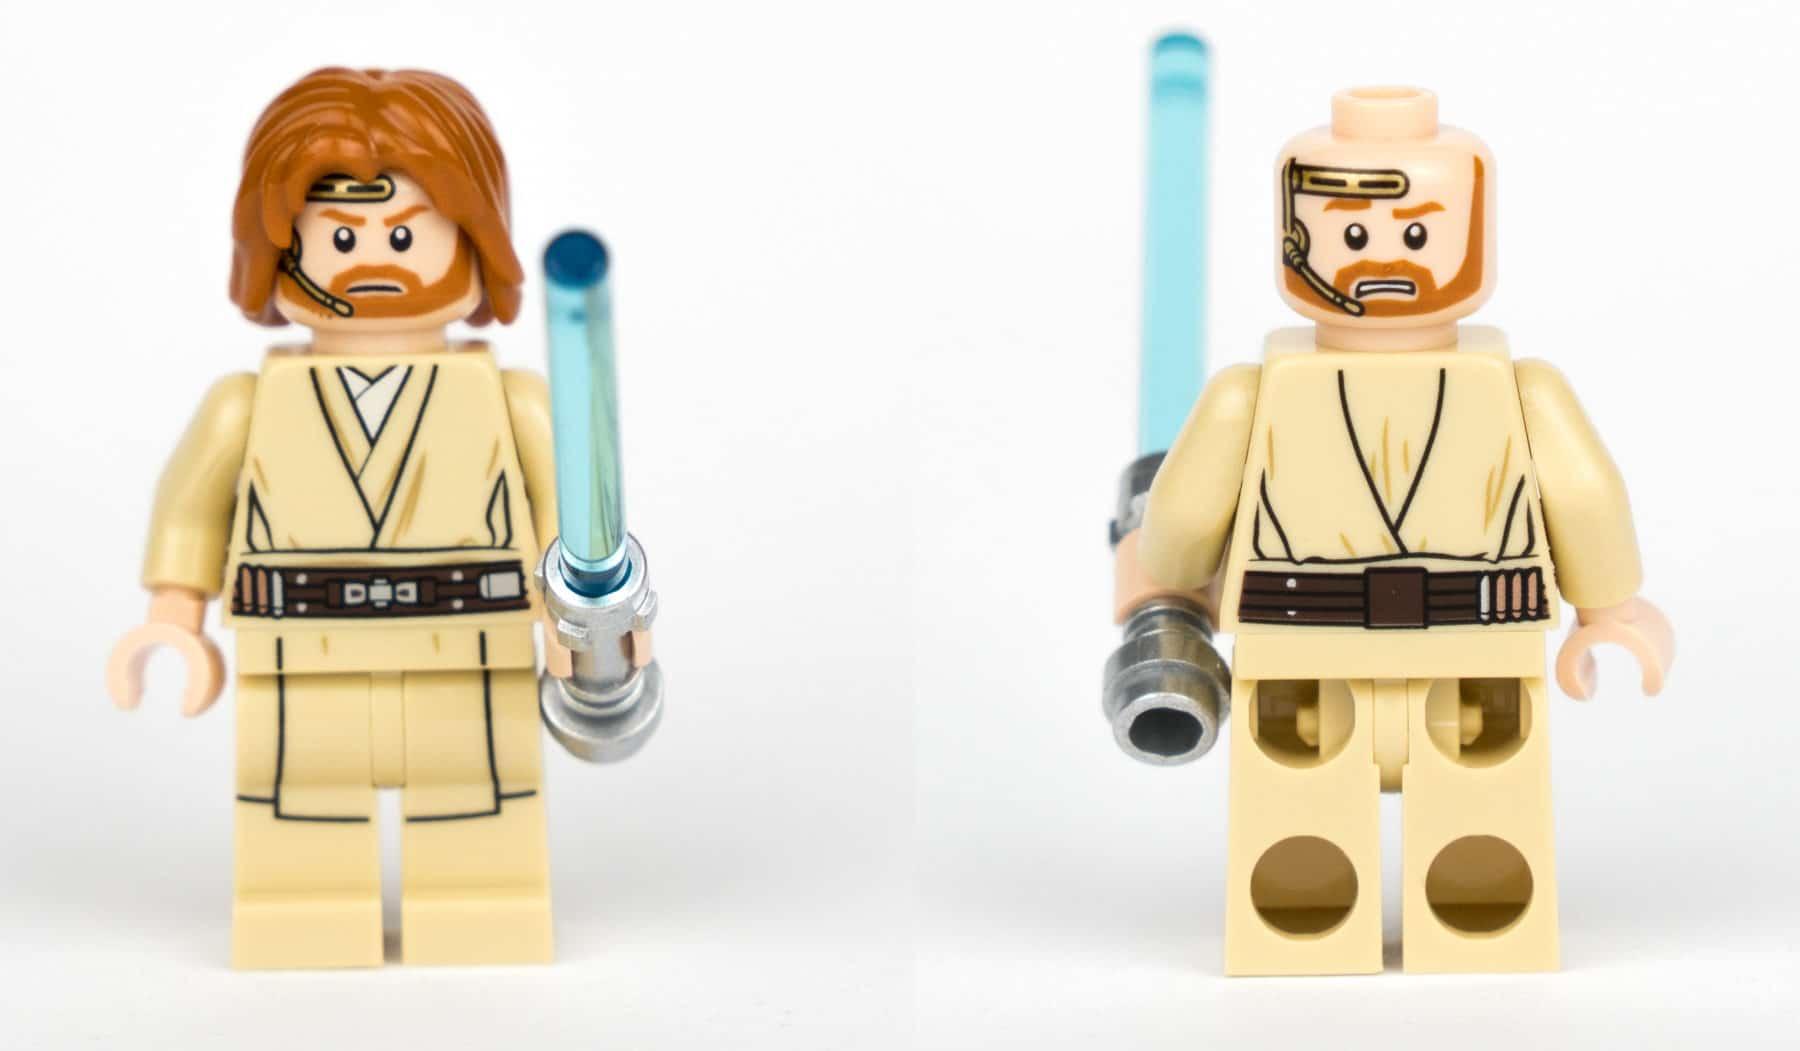 LEGO Star Wars Magazin #39 Obi-Wan Kenobi Minifigur